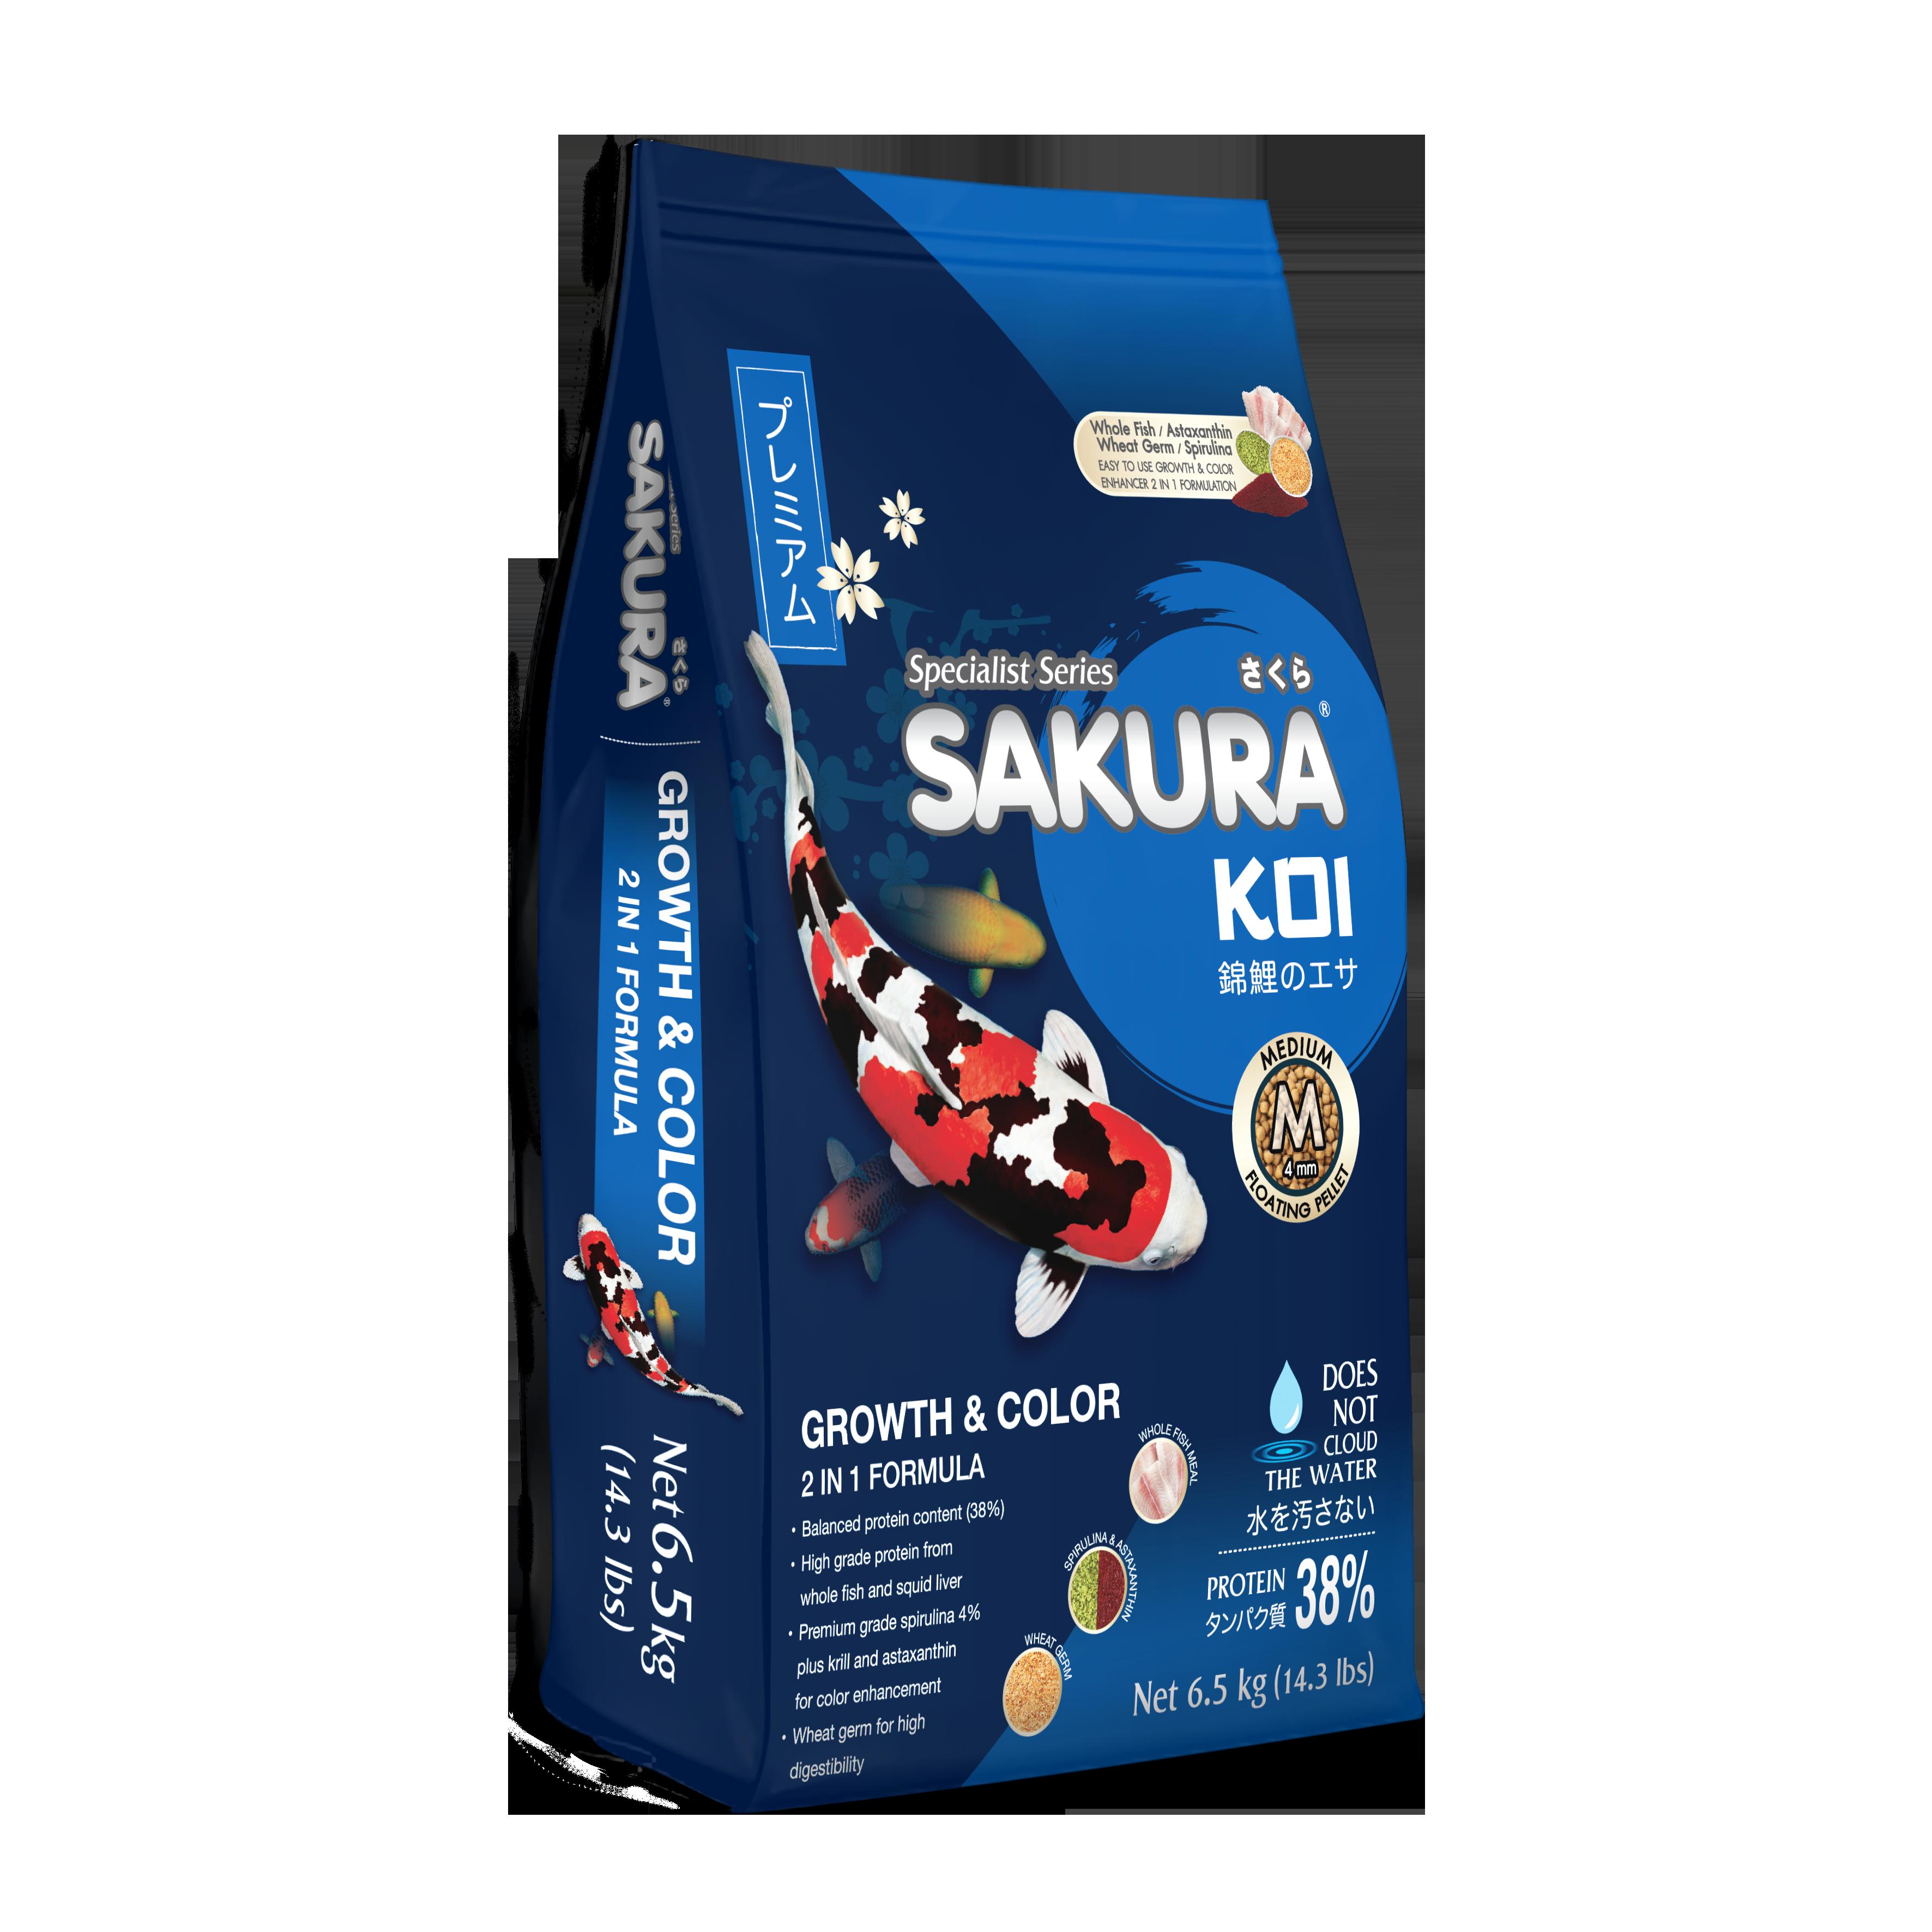 Sakura Koi Growth Color 2 In 1 Formula อาหารปลาคาร ฟเร งโต เร งส แบบ 2 อ น 1 ในถ งเด ยวก น ขนาด 6 5 ก โลกร ม เพ อการเล ยงปลาท สะดวกและให ผลล พธ ท ยอดเย แบบ